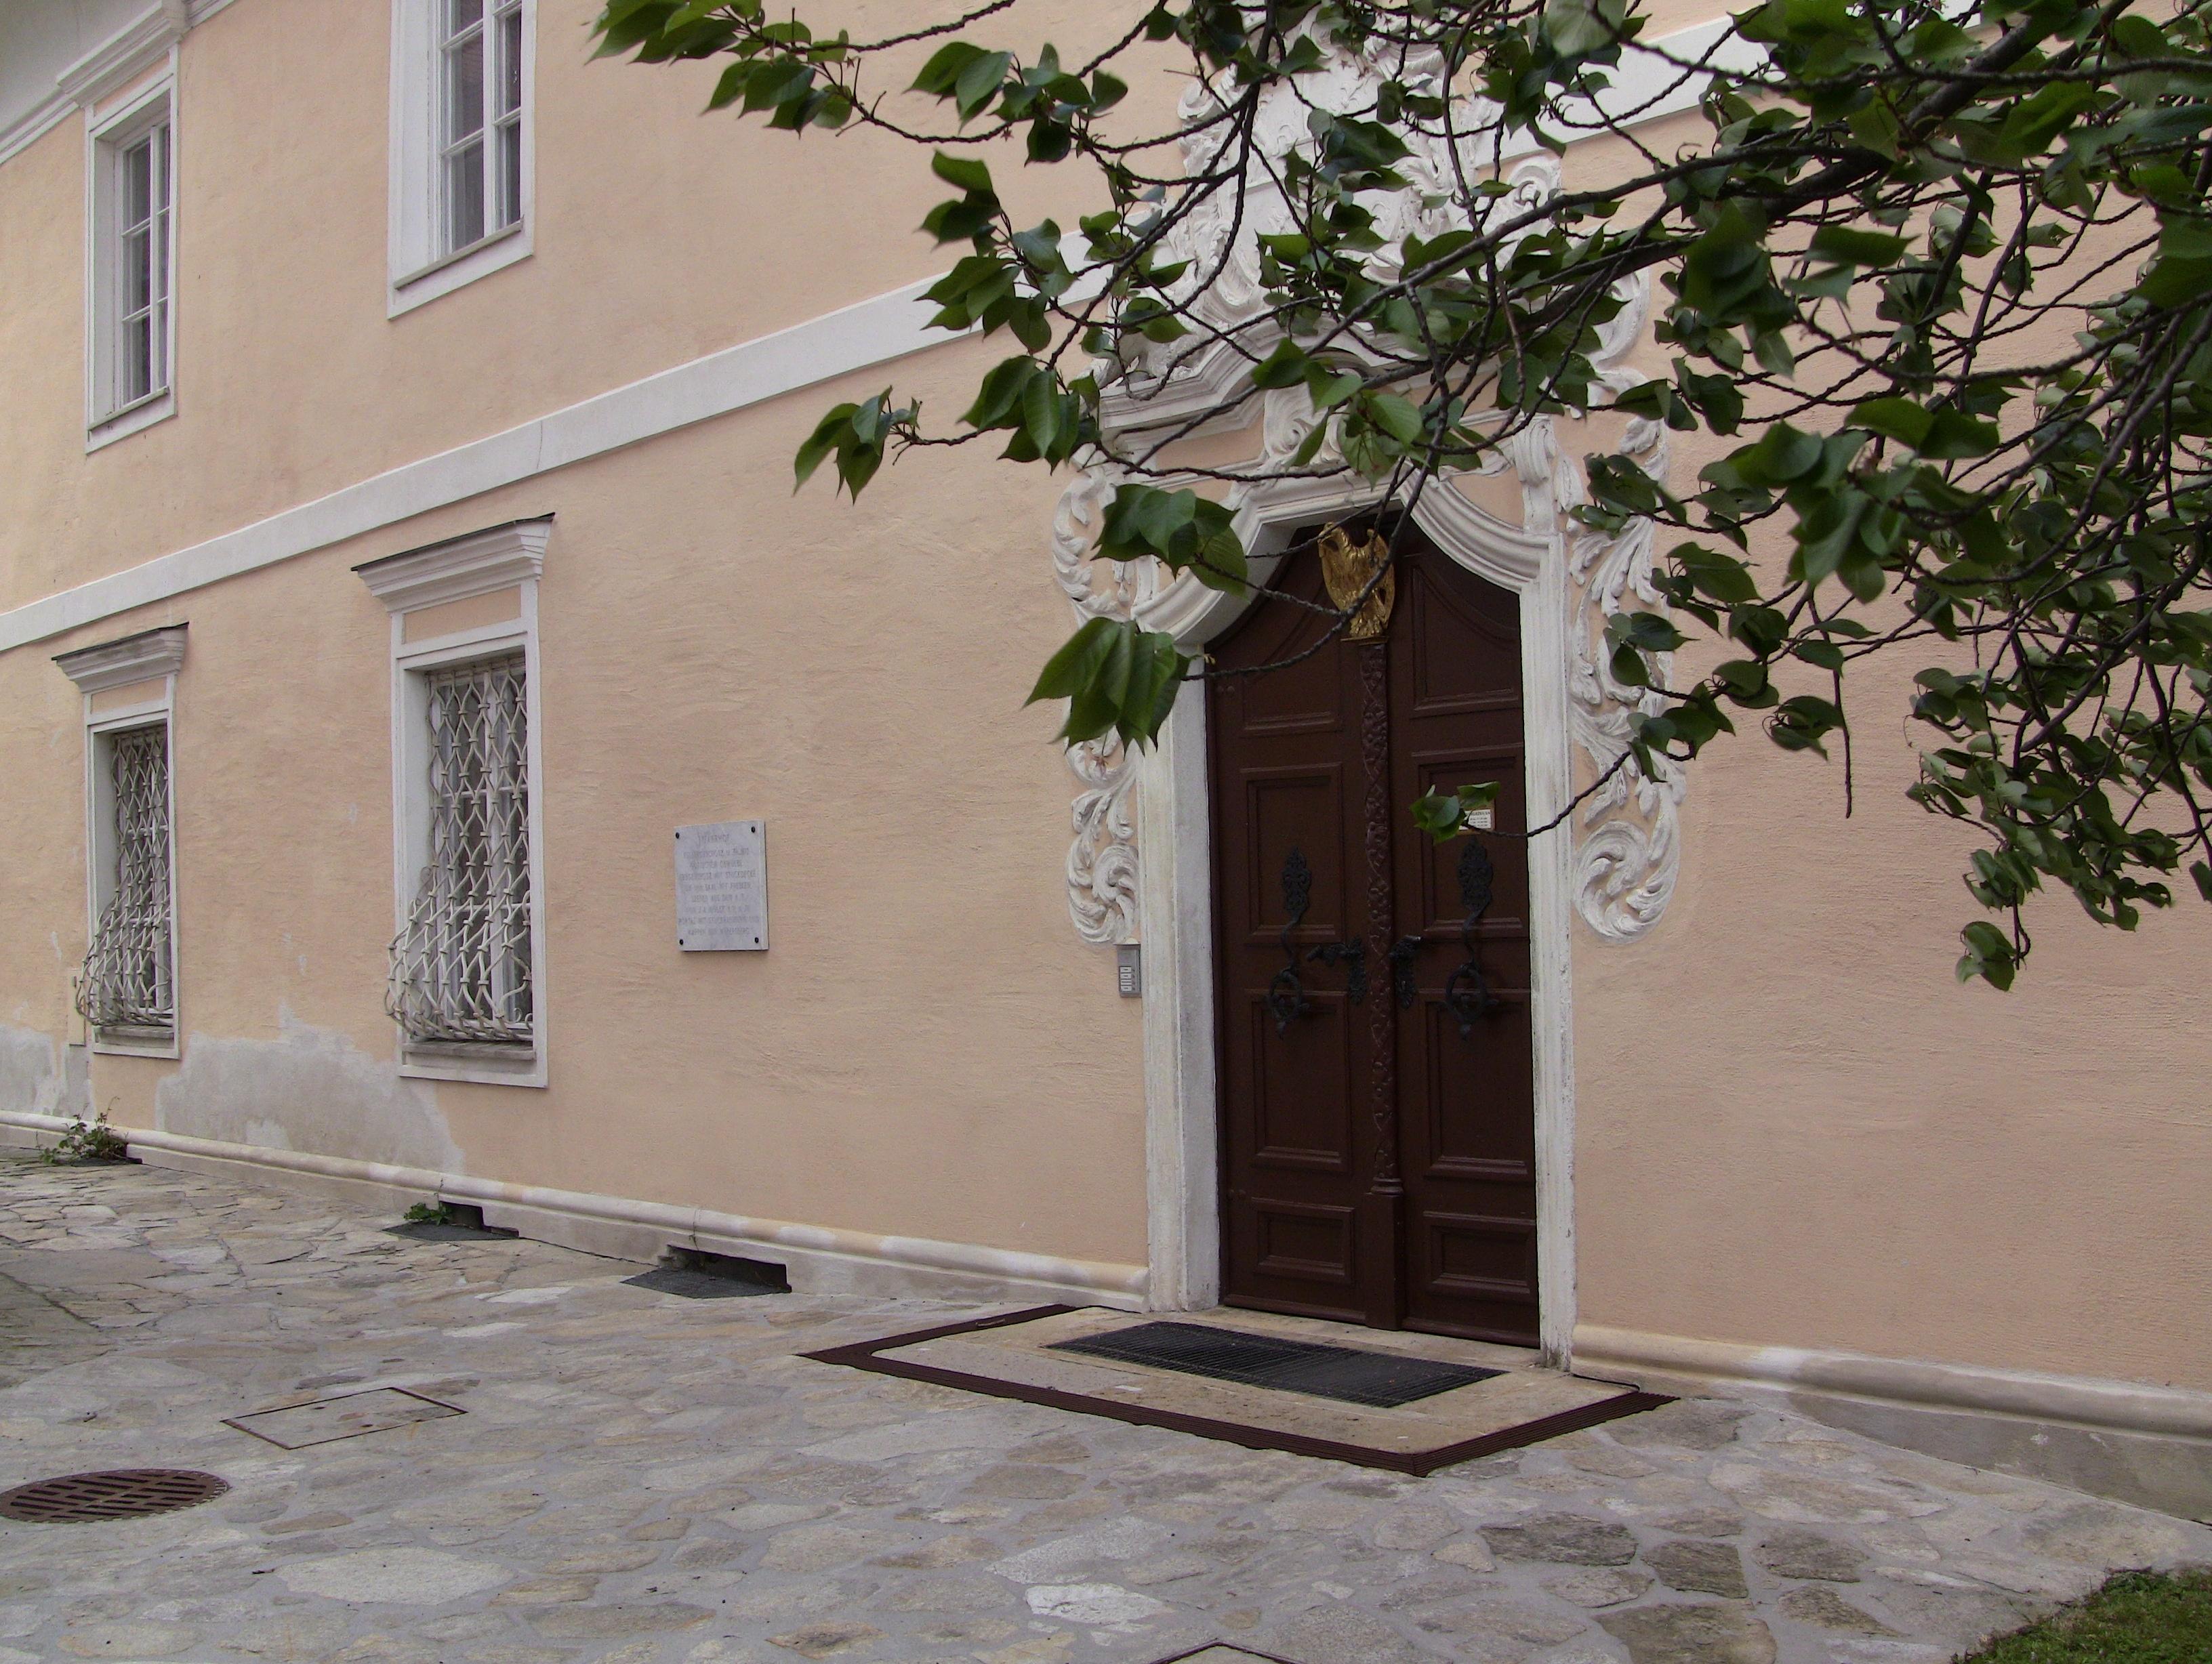 Eingang zum Pfarrhof